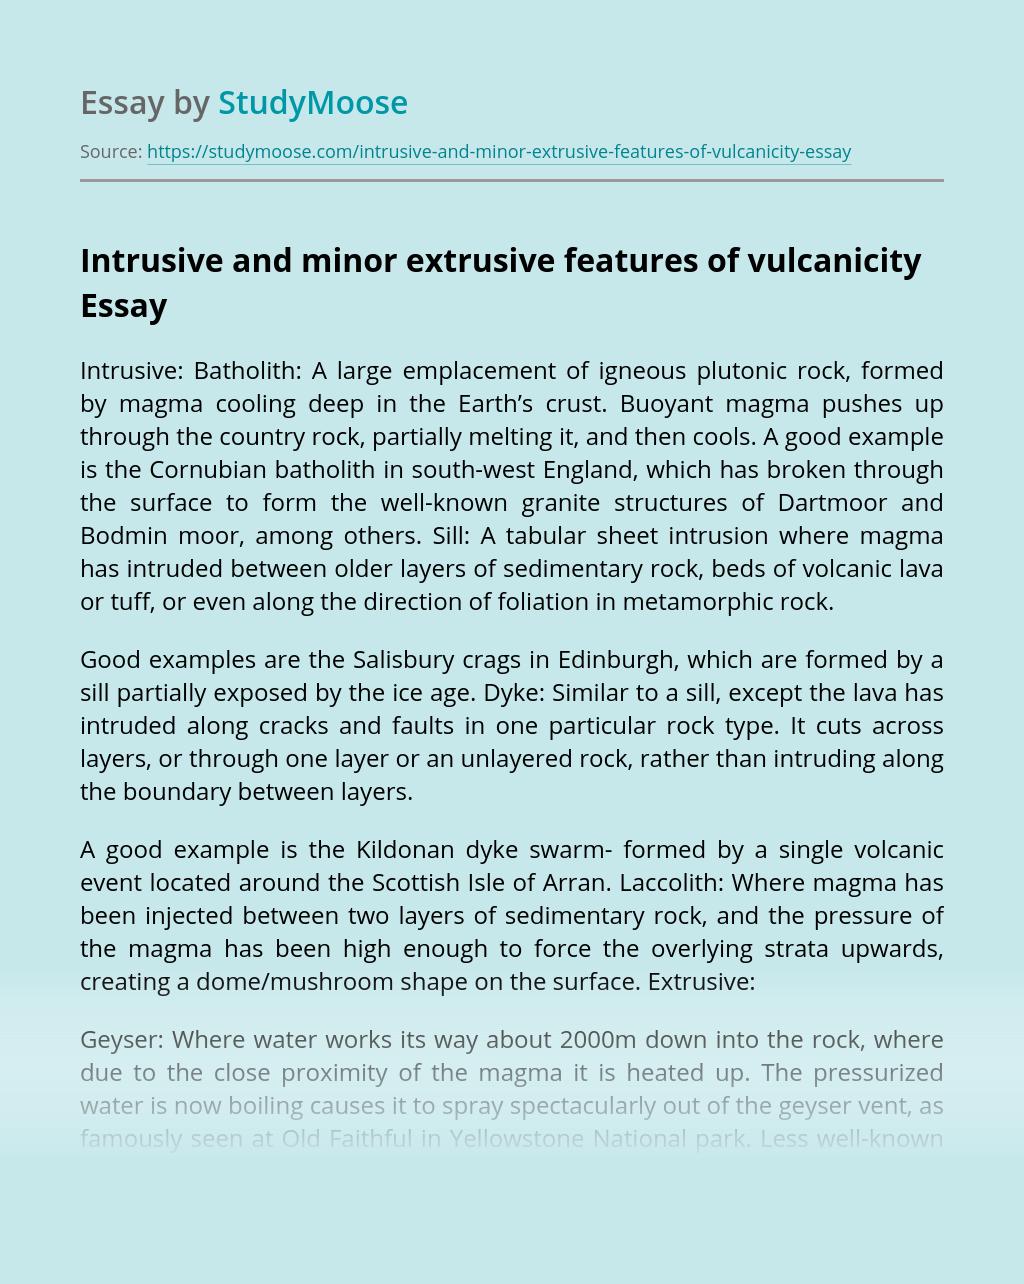 Intrusive and minor extrusive features of vulcanicity